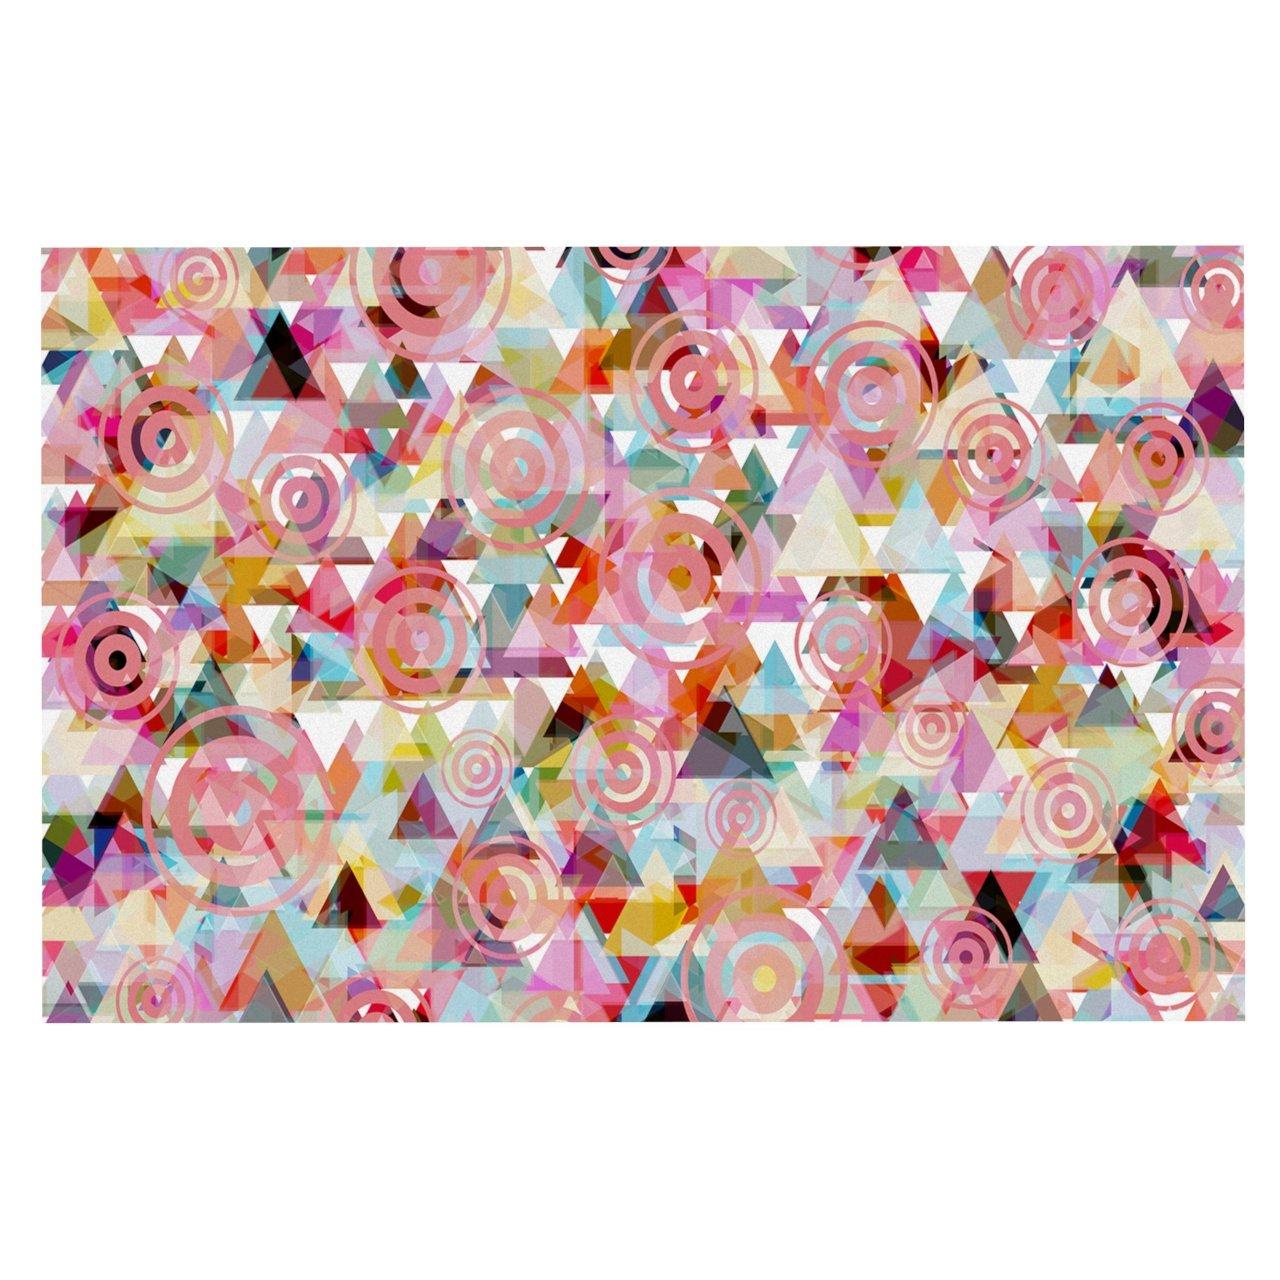 KESS InHouse SC2065ADM02 Suzanne Carter Geo Pink Multicolor Dog Place Mat, 24  x 15